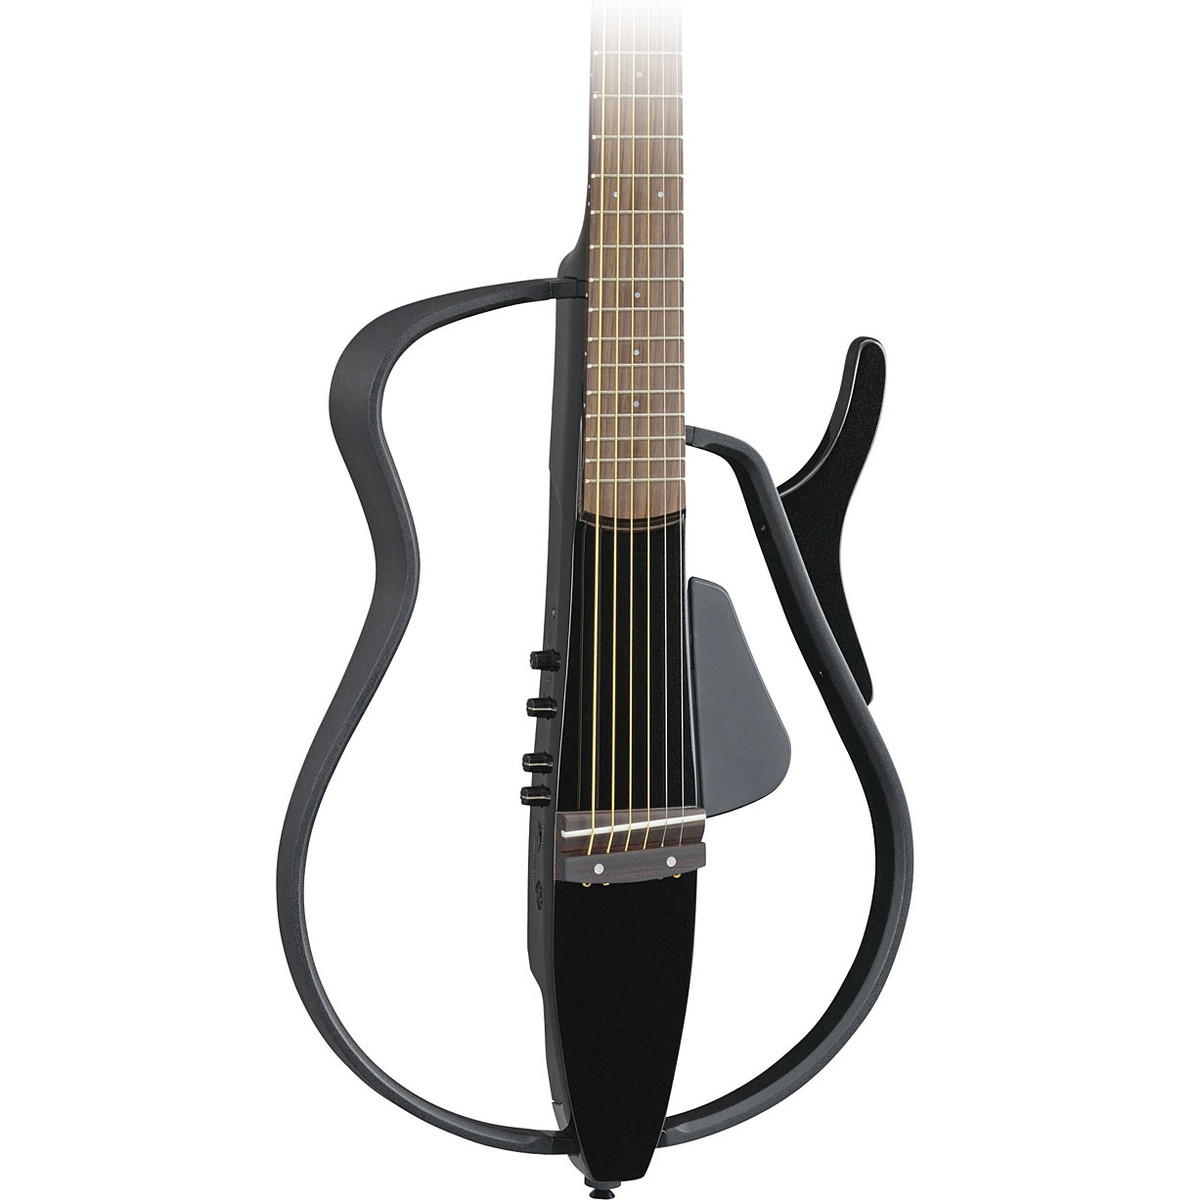 disc yamaha slg110s silent guitar black metallic at gear4music. Black Bedroom Furniture Sets. Home Design Ideas